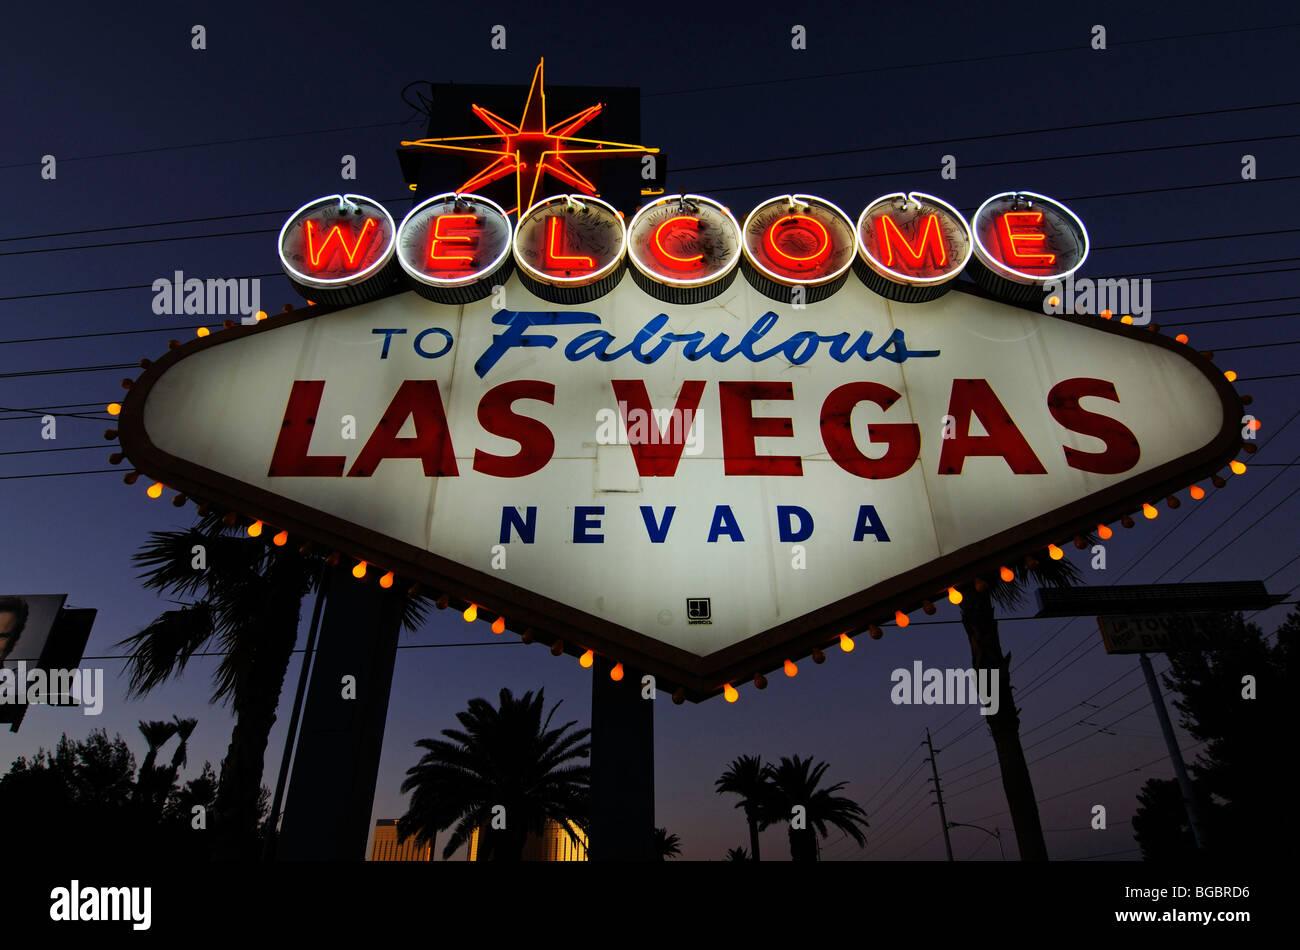 Welcome sign, Las Vegas, Nevada, USA Stock Photo